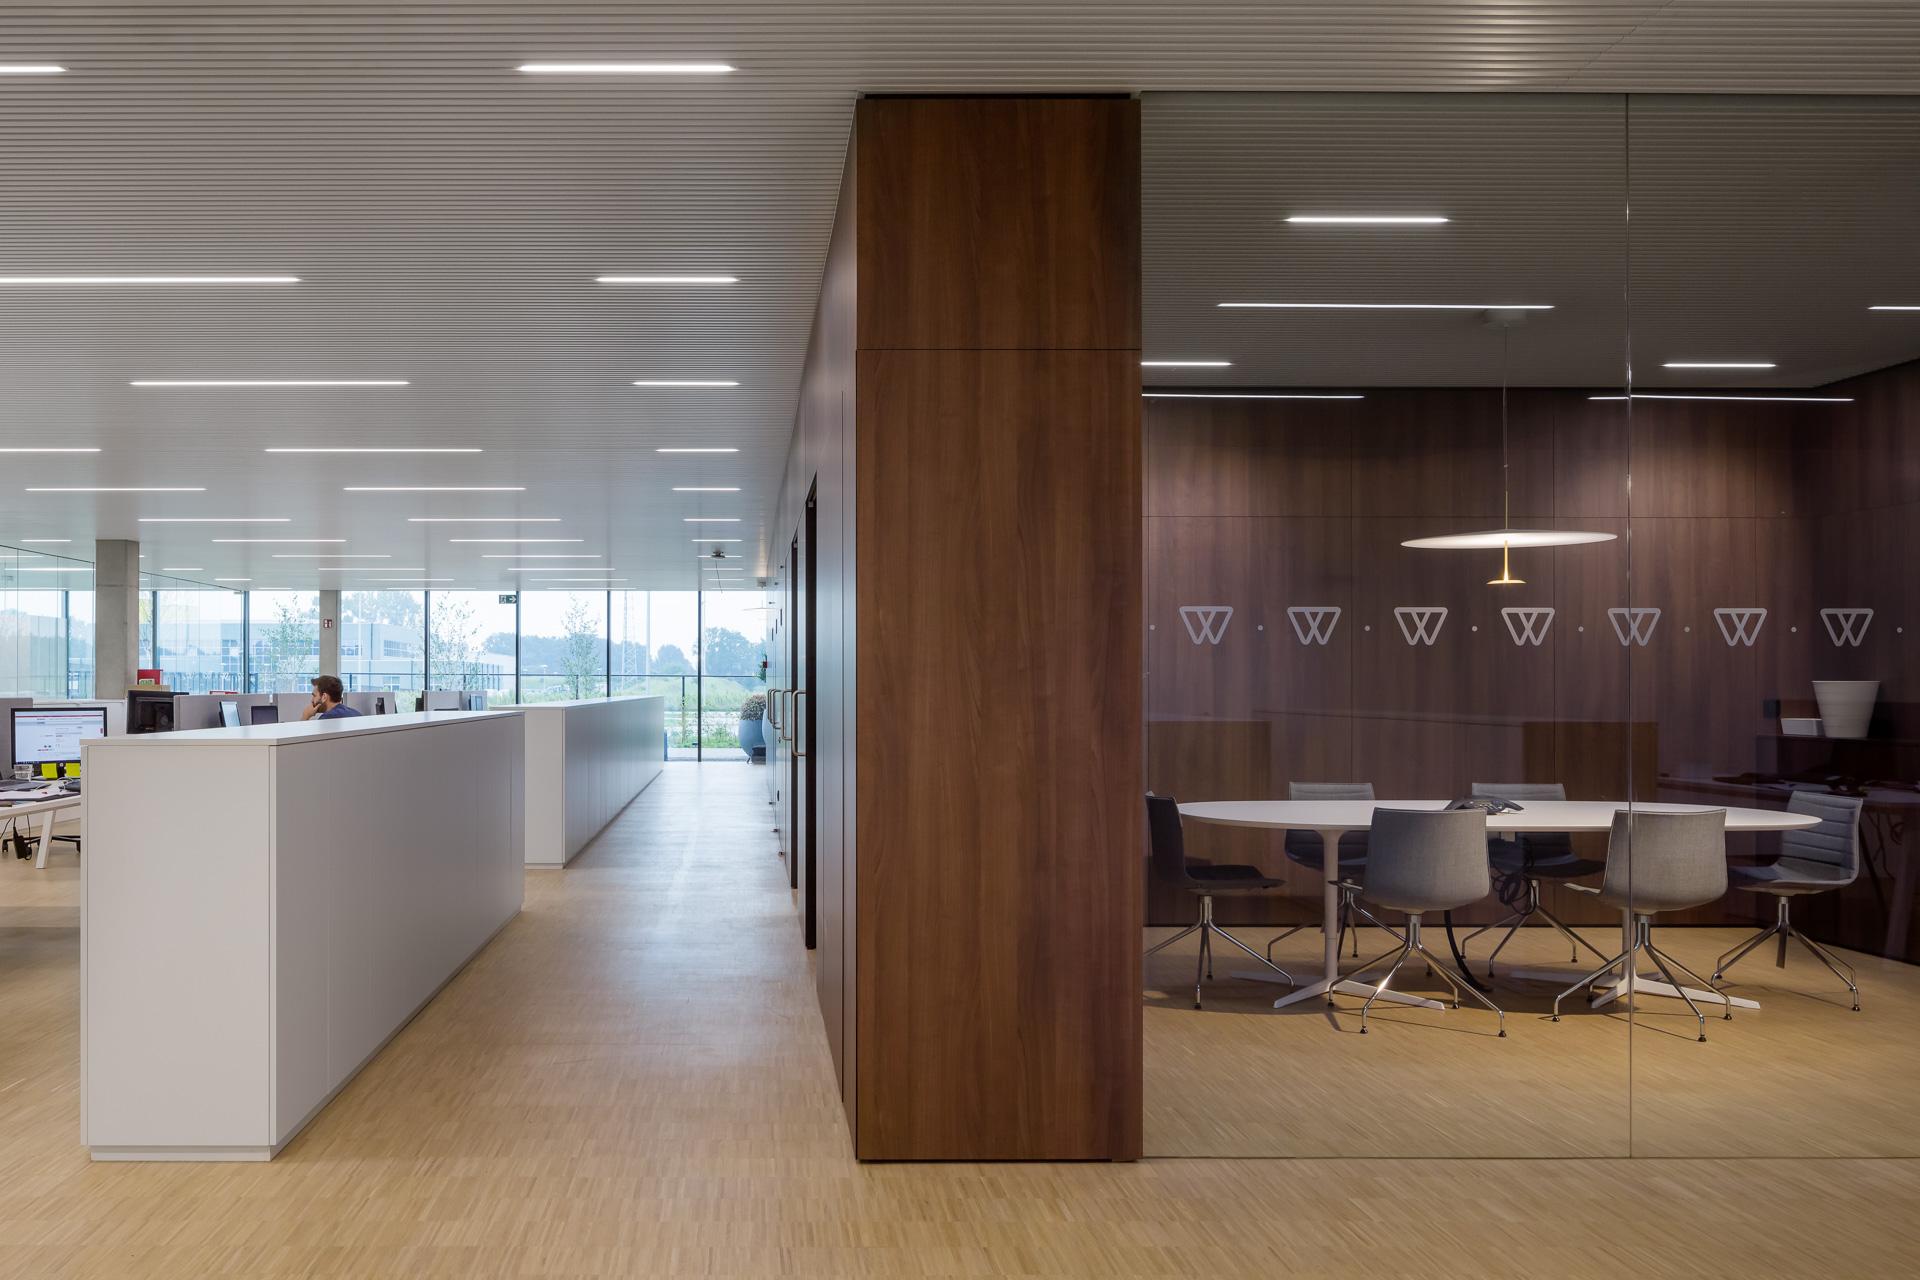 Geel | Interieur open werkplek + vergaderruimte